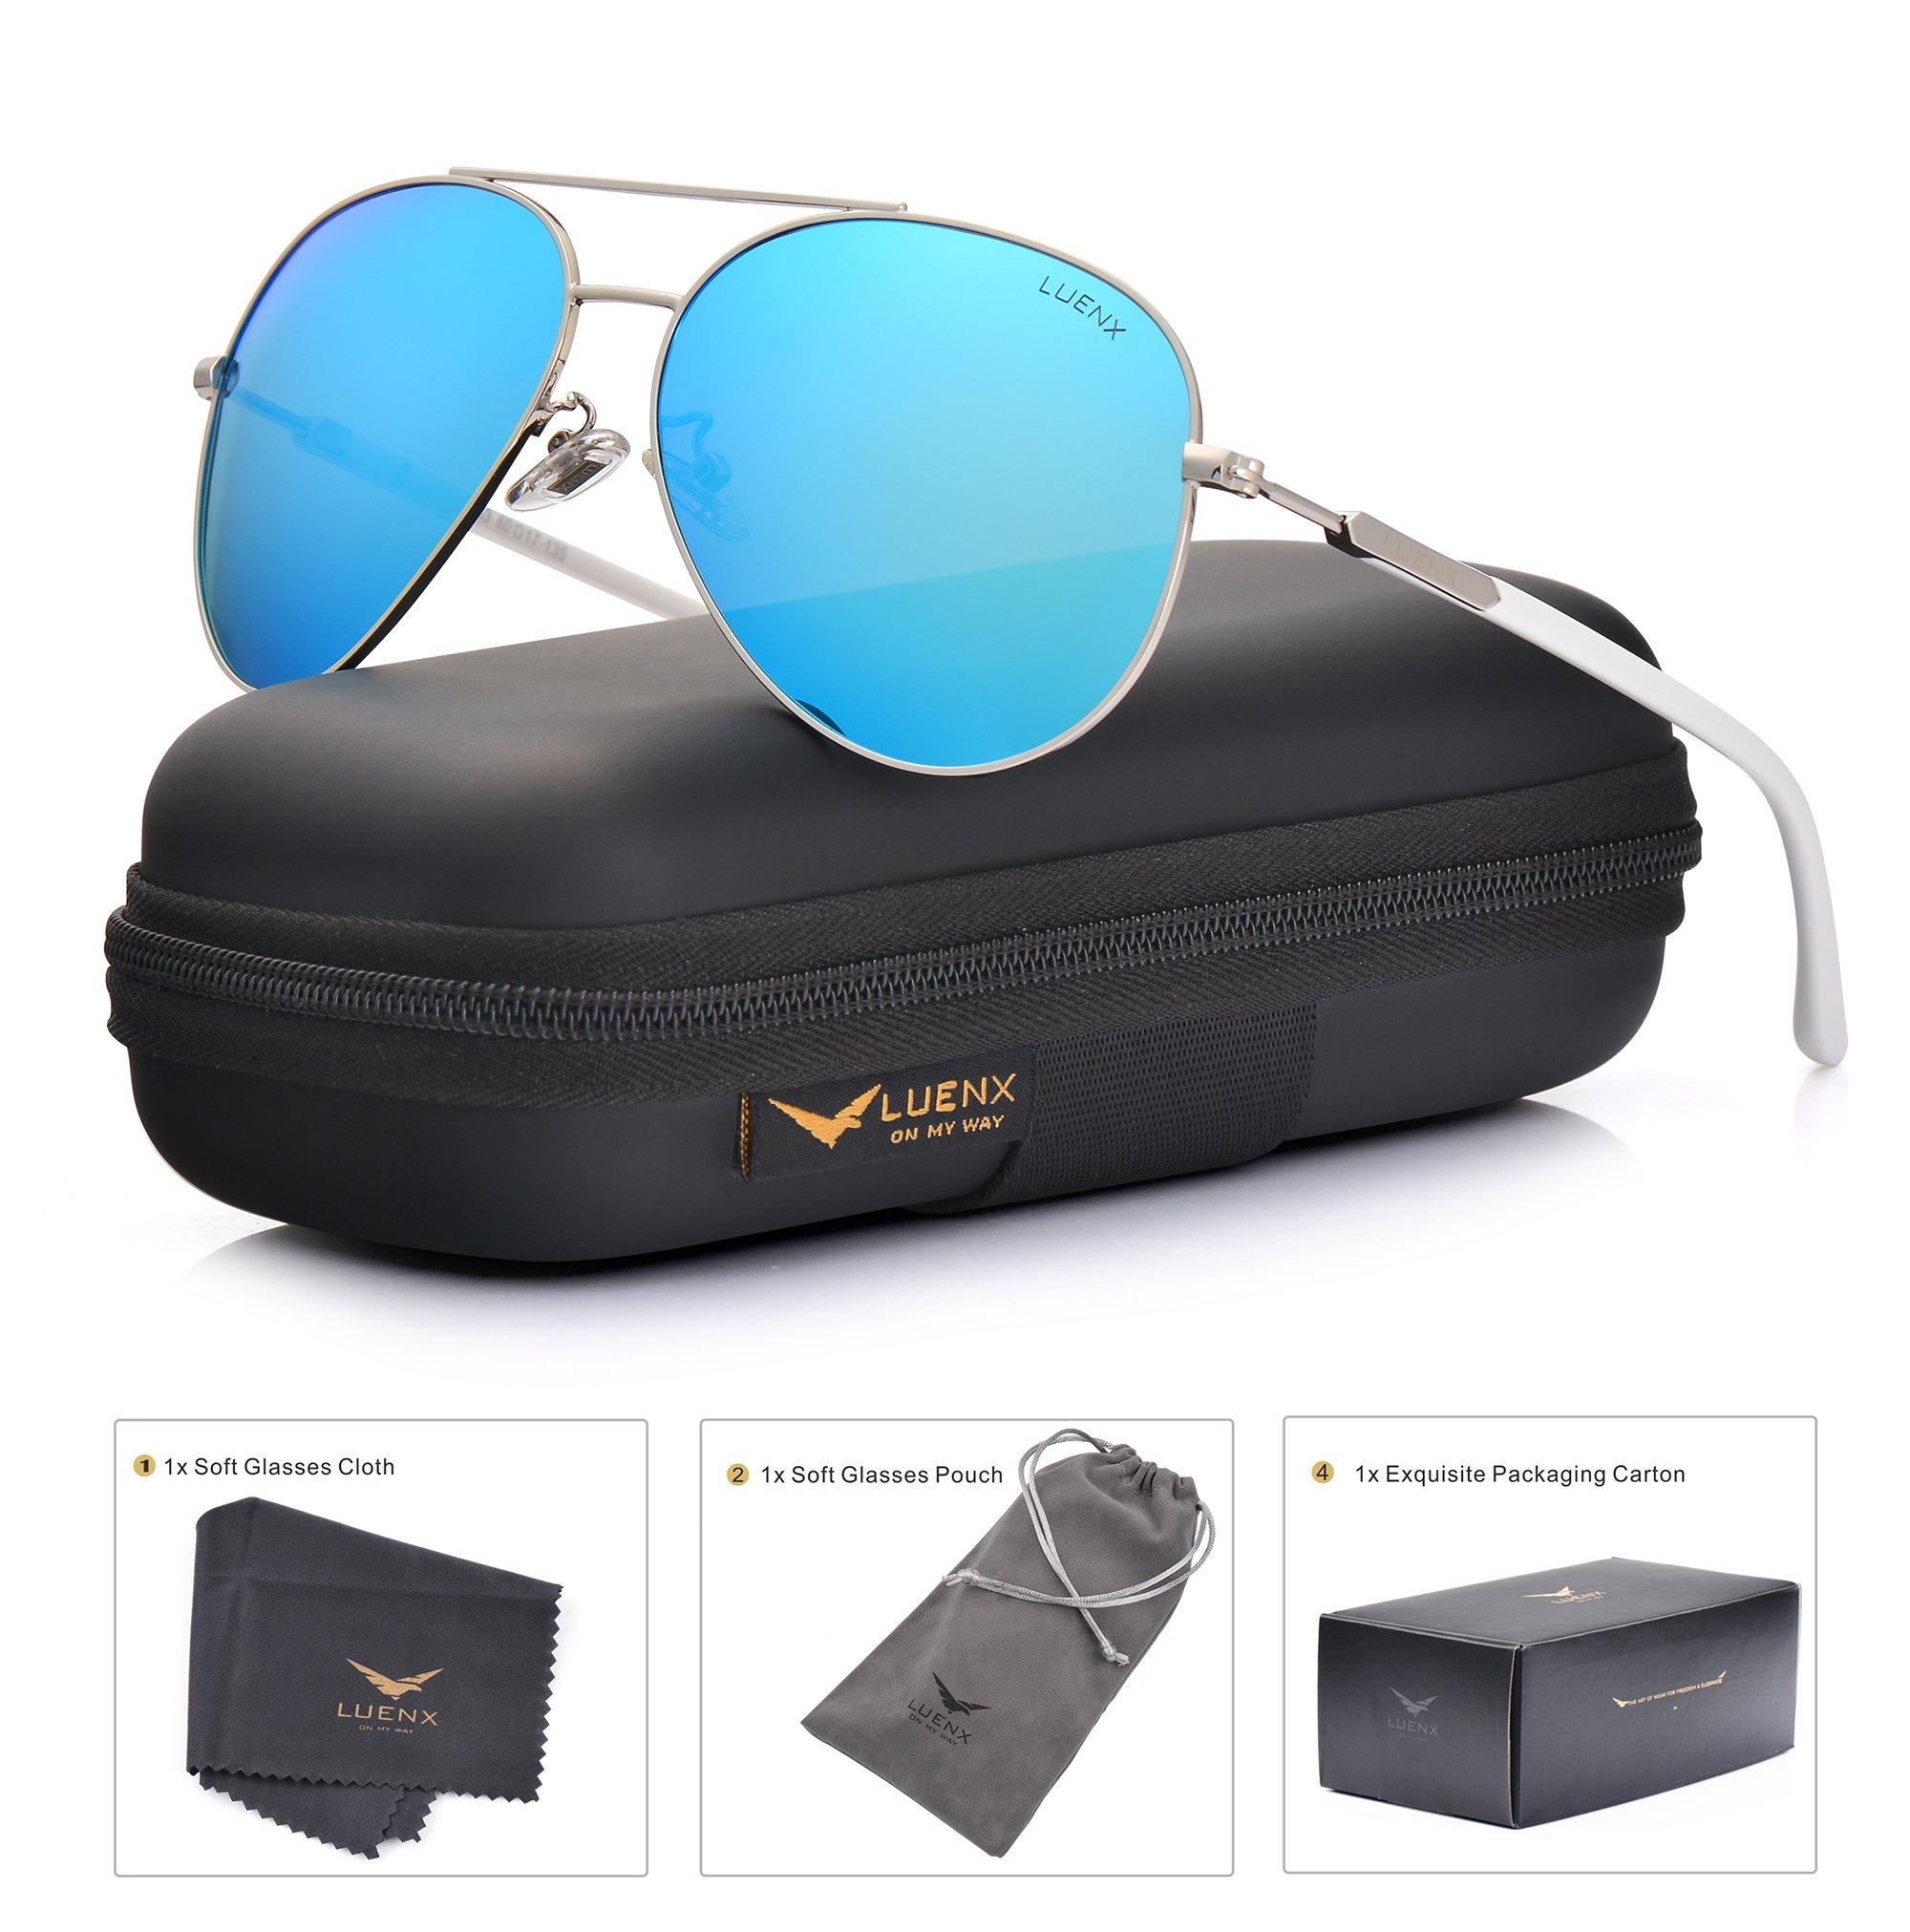 LUENX Aviator Sunglasses Mens Womens Polarized Mirror - UV 400 Protection Light Blue Lens Silver Frame 60mm